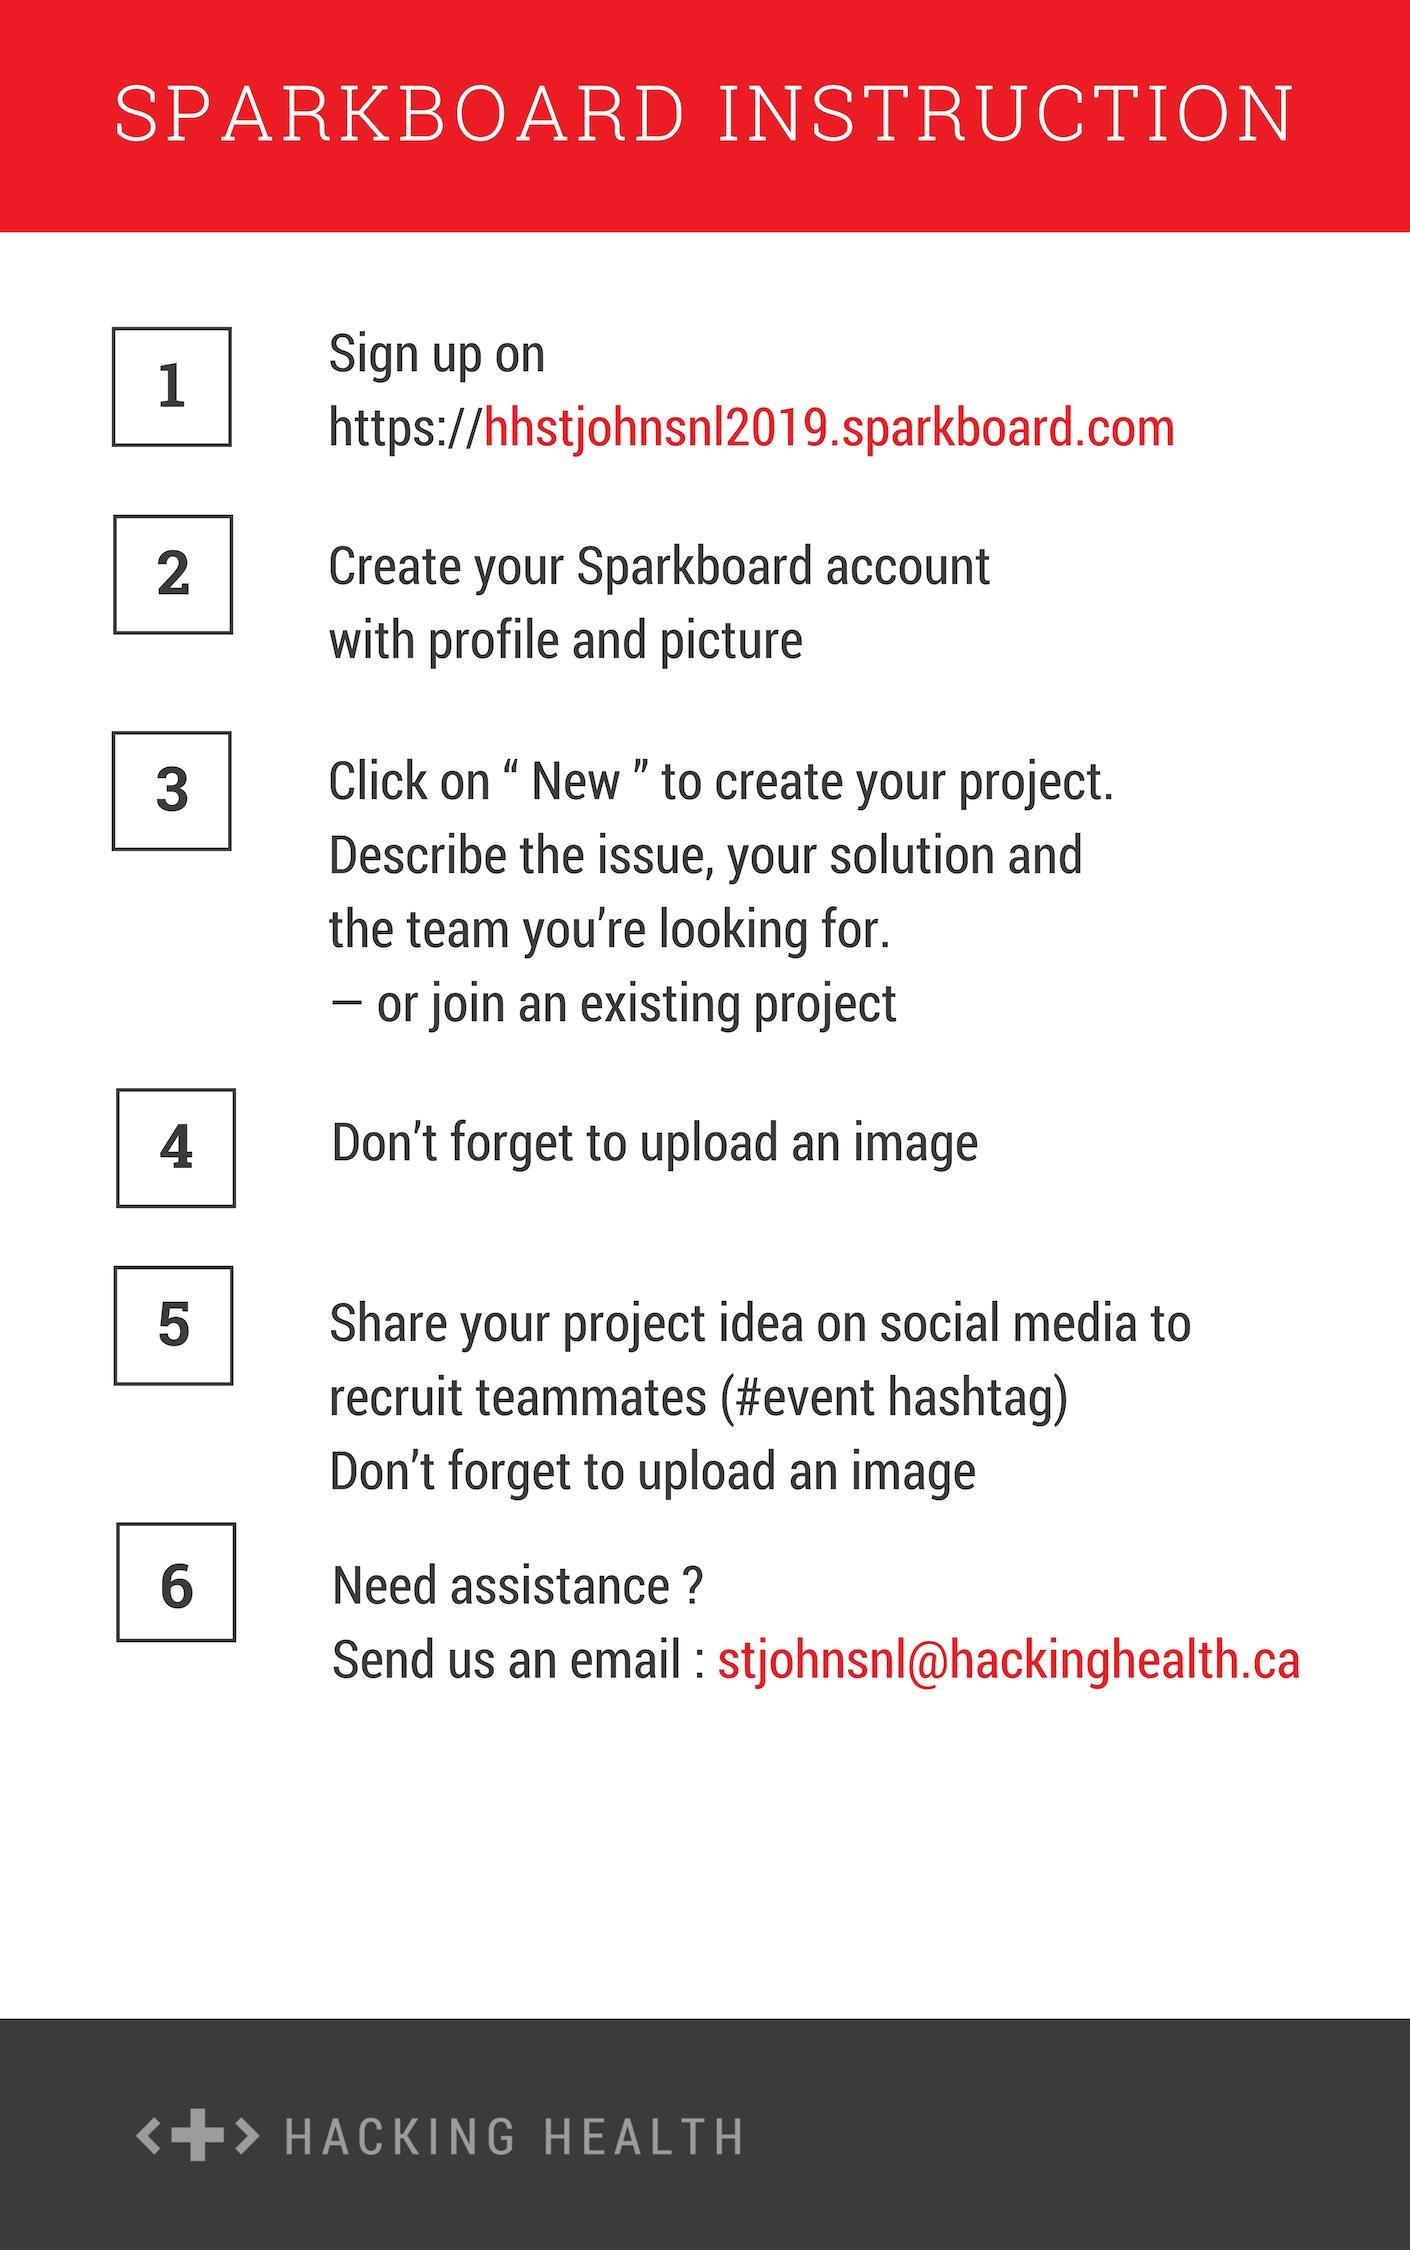 Sparkboard instructions